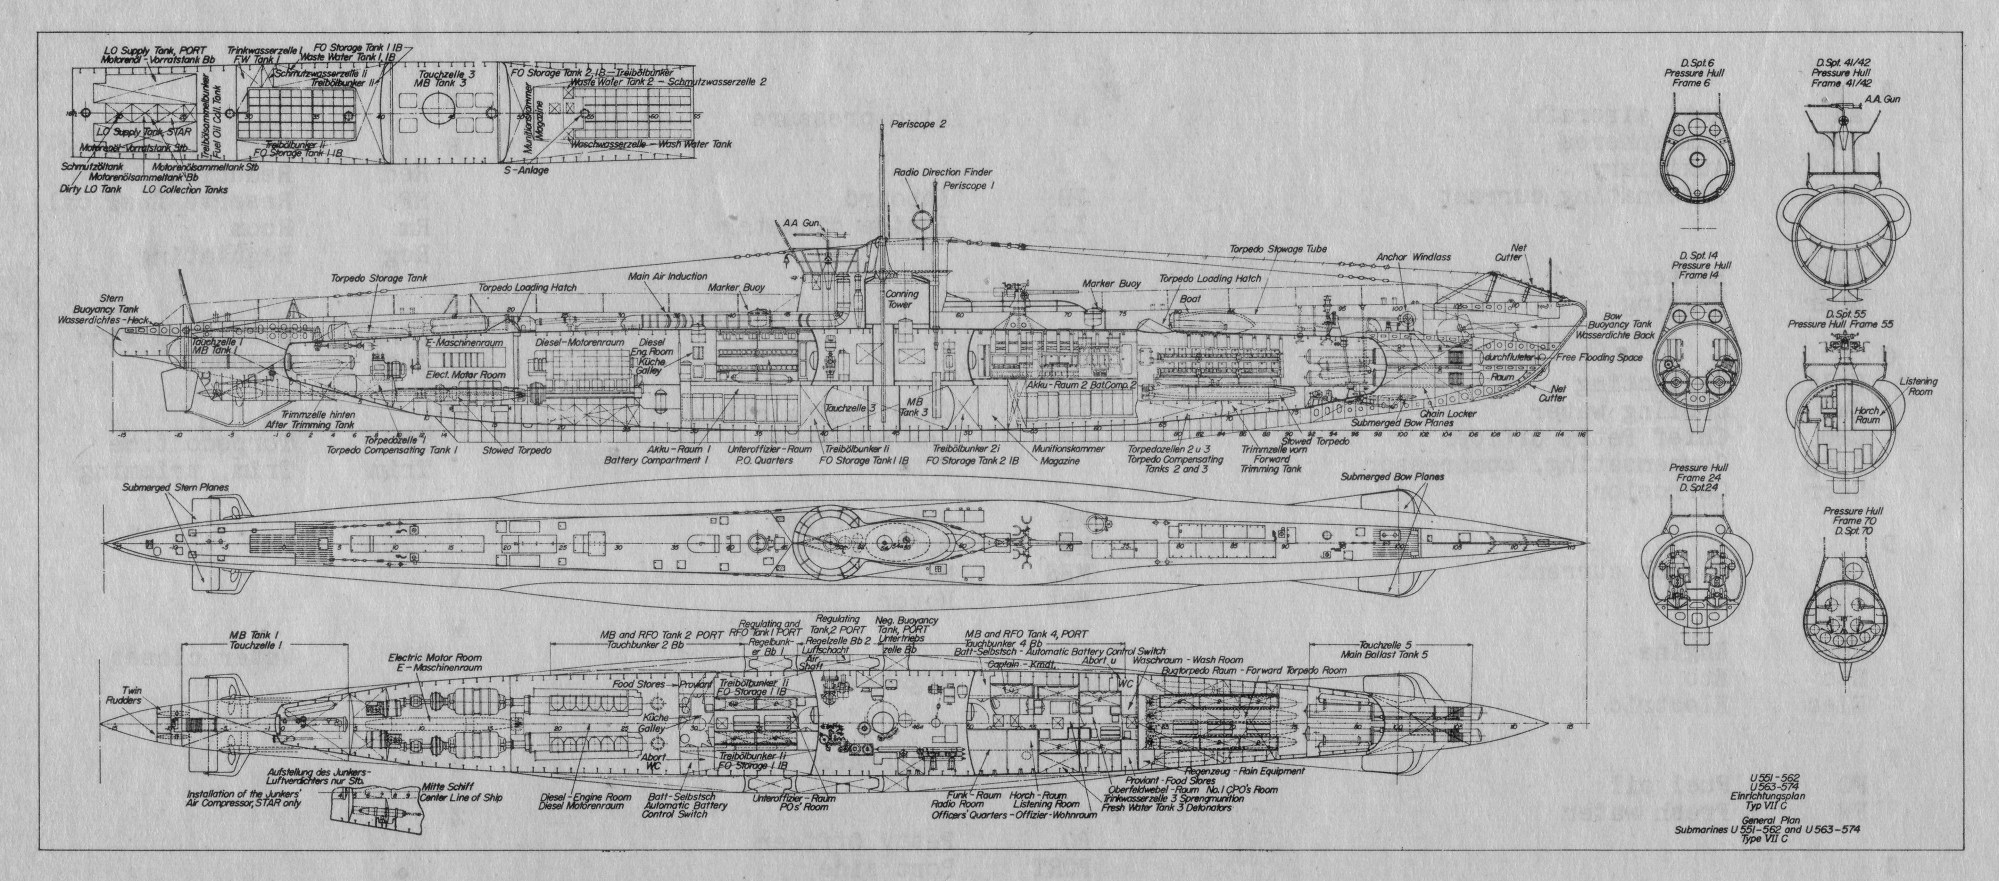 hight resolution of 6238x2750 filetype viic u boat schematic drawing u boat drawing